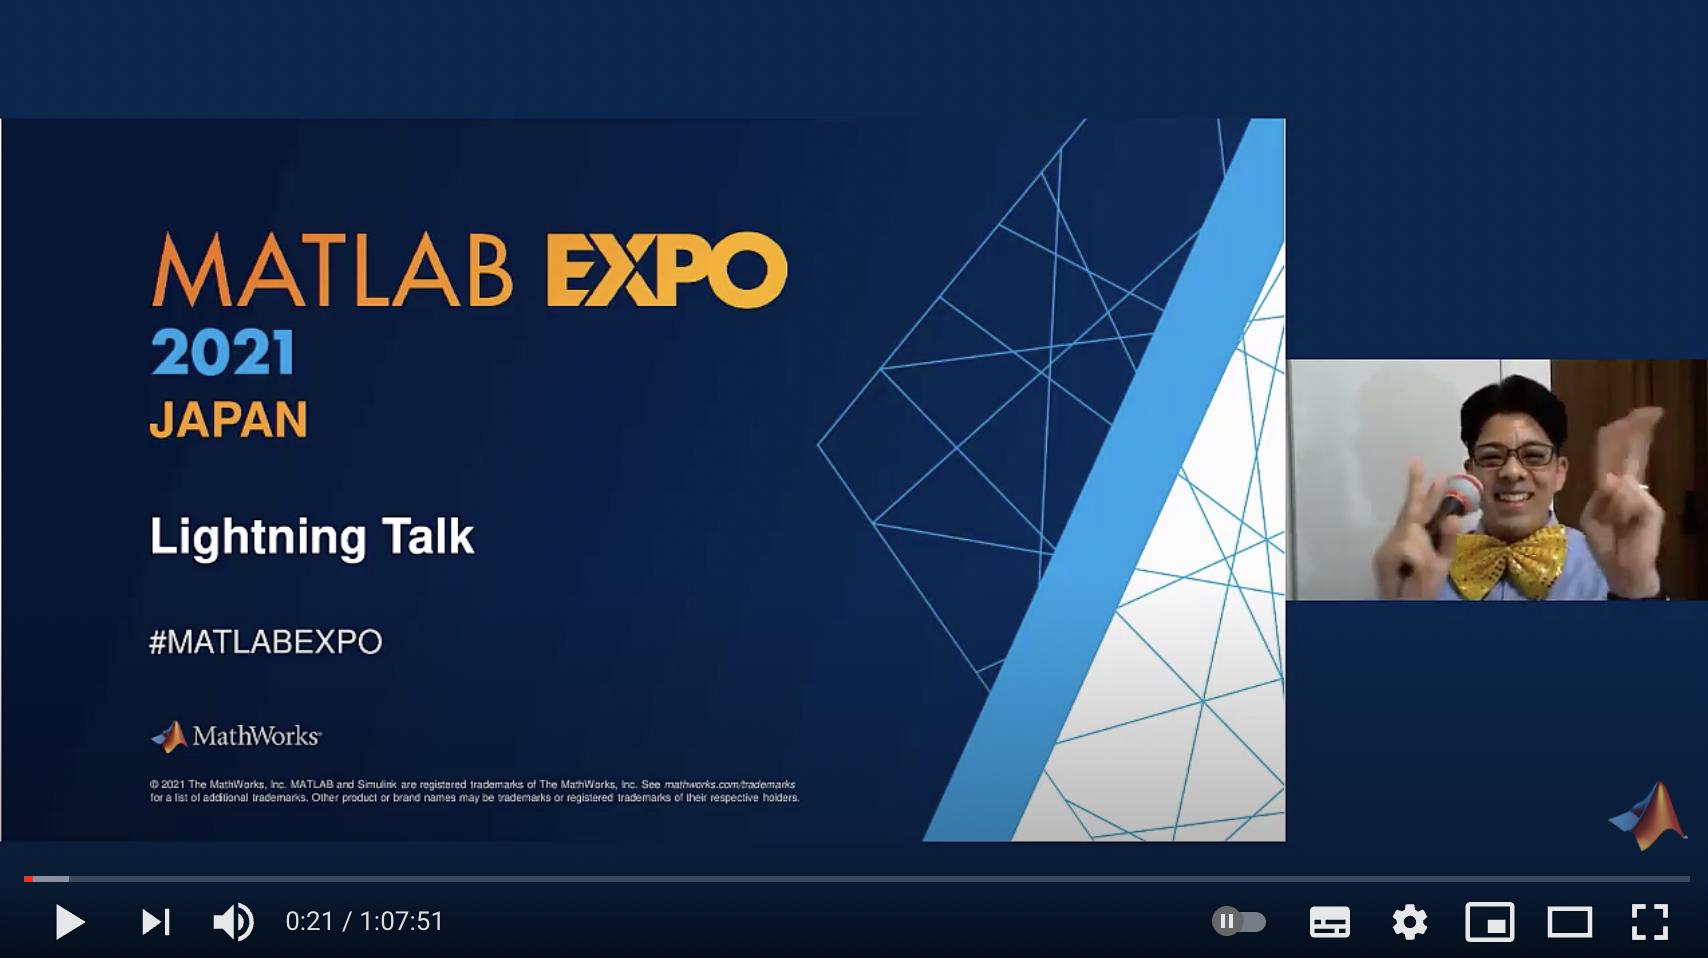 MATLAB EXPO 2021 Japanでのコミュニティーイベント